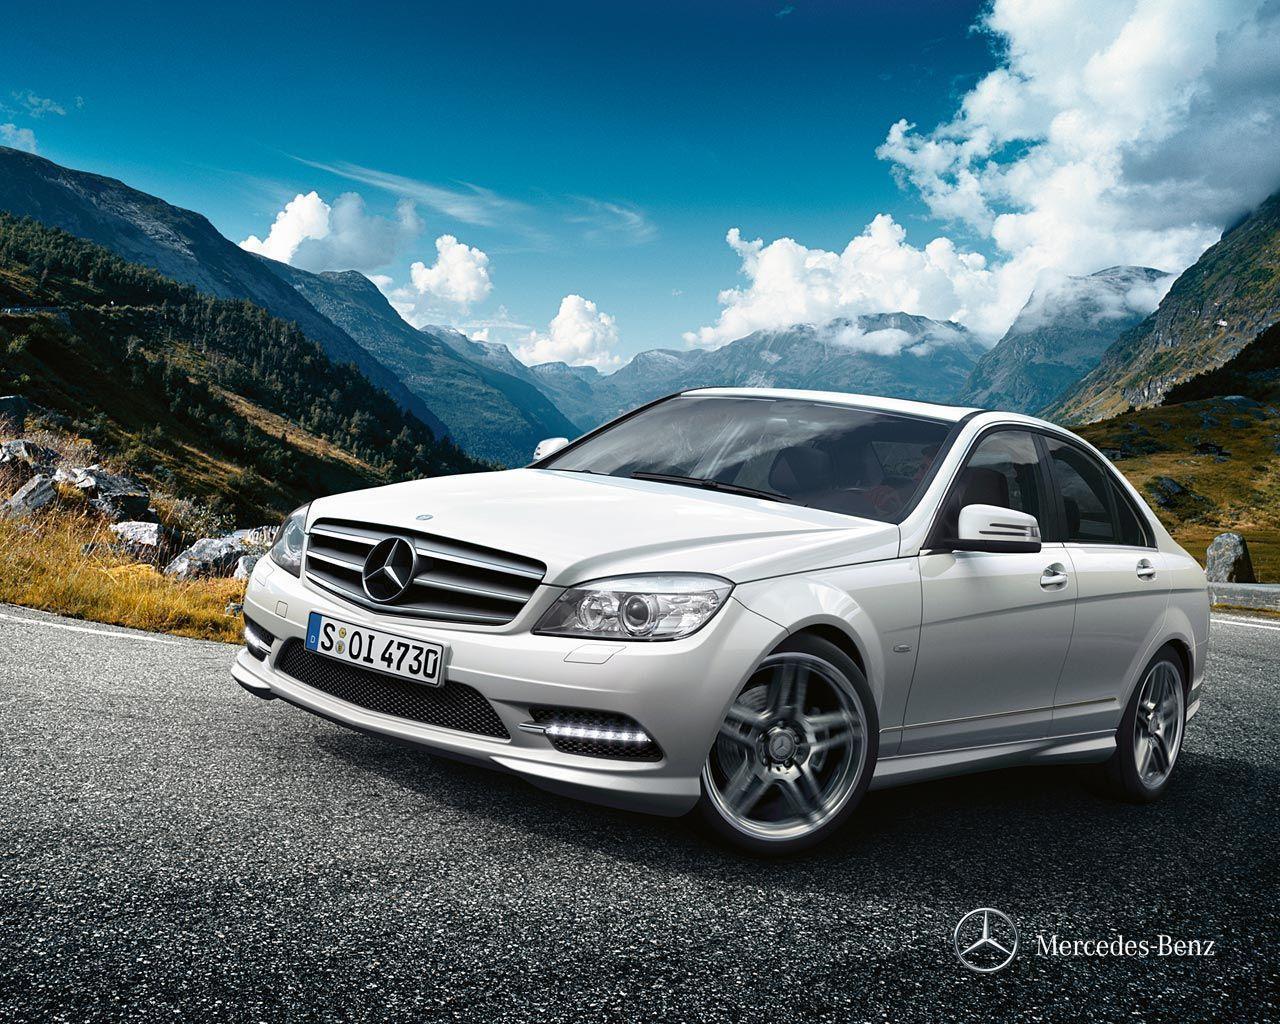 Mercedes Benz Wallpapers 1280x1024